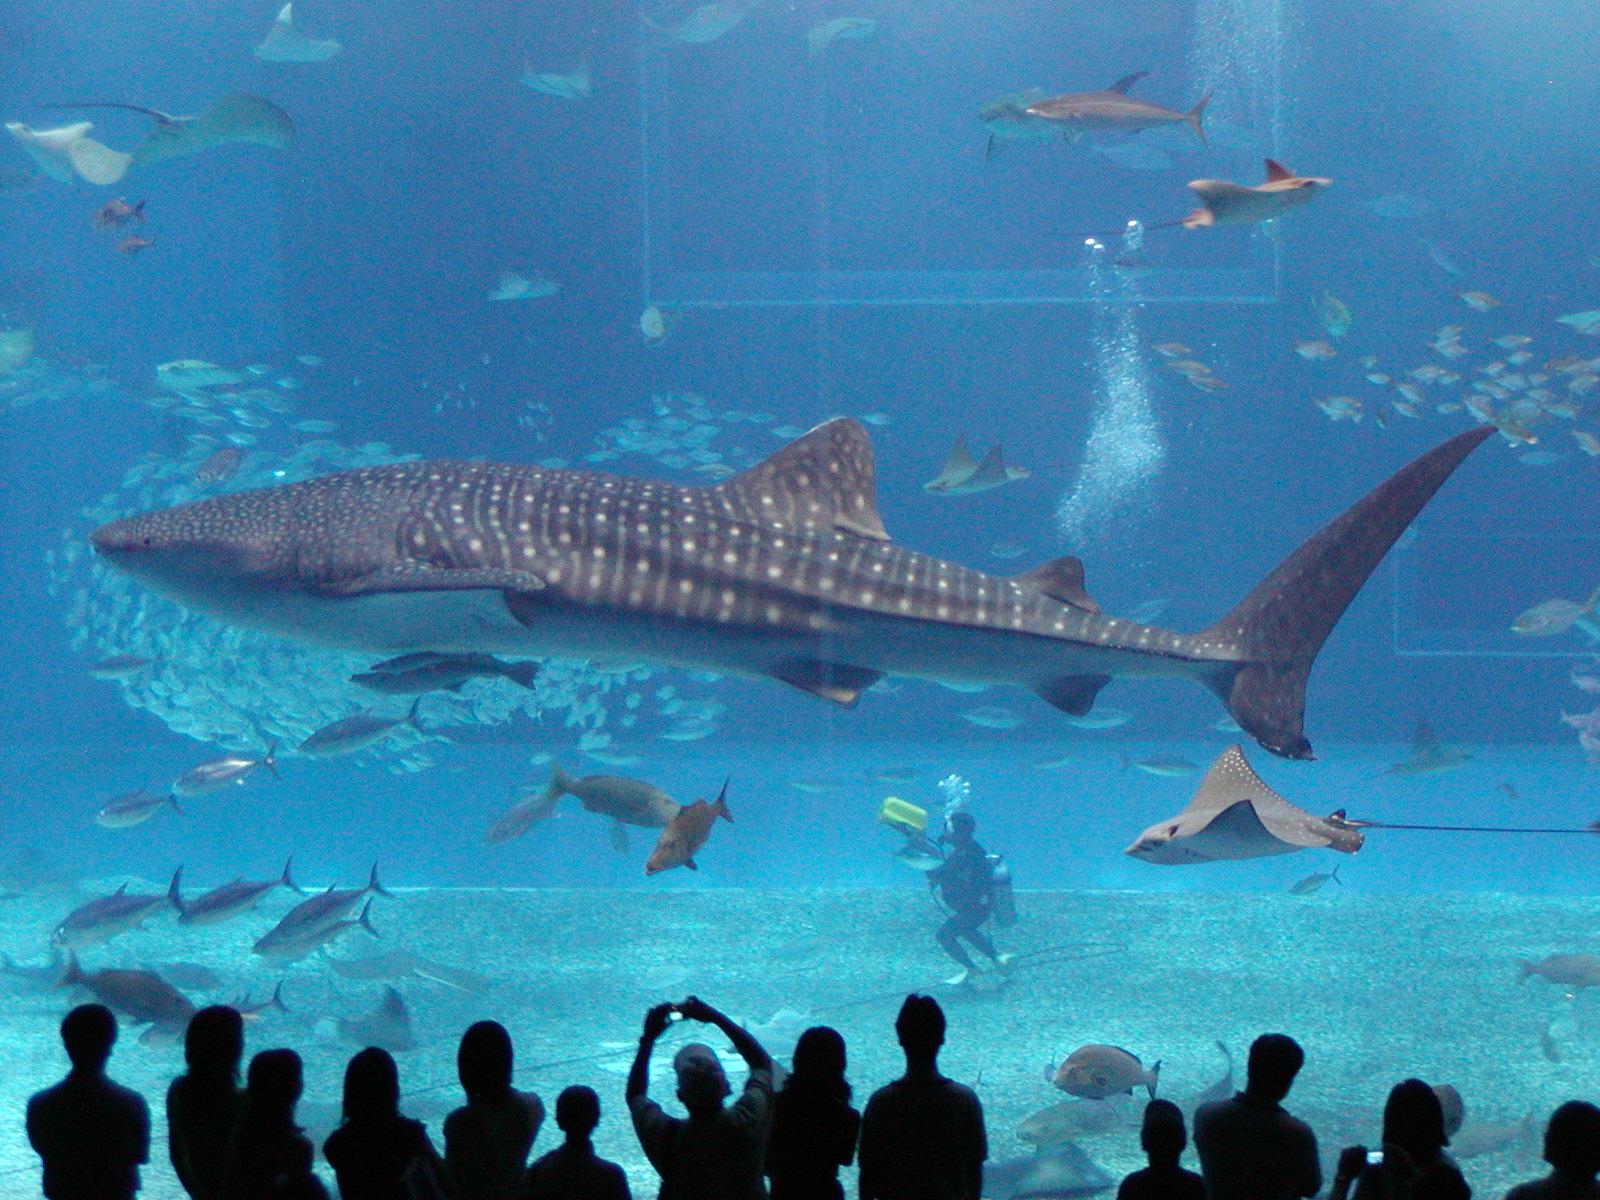 Break comcs: Five Shark Stories and HD wallapers